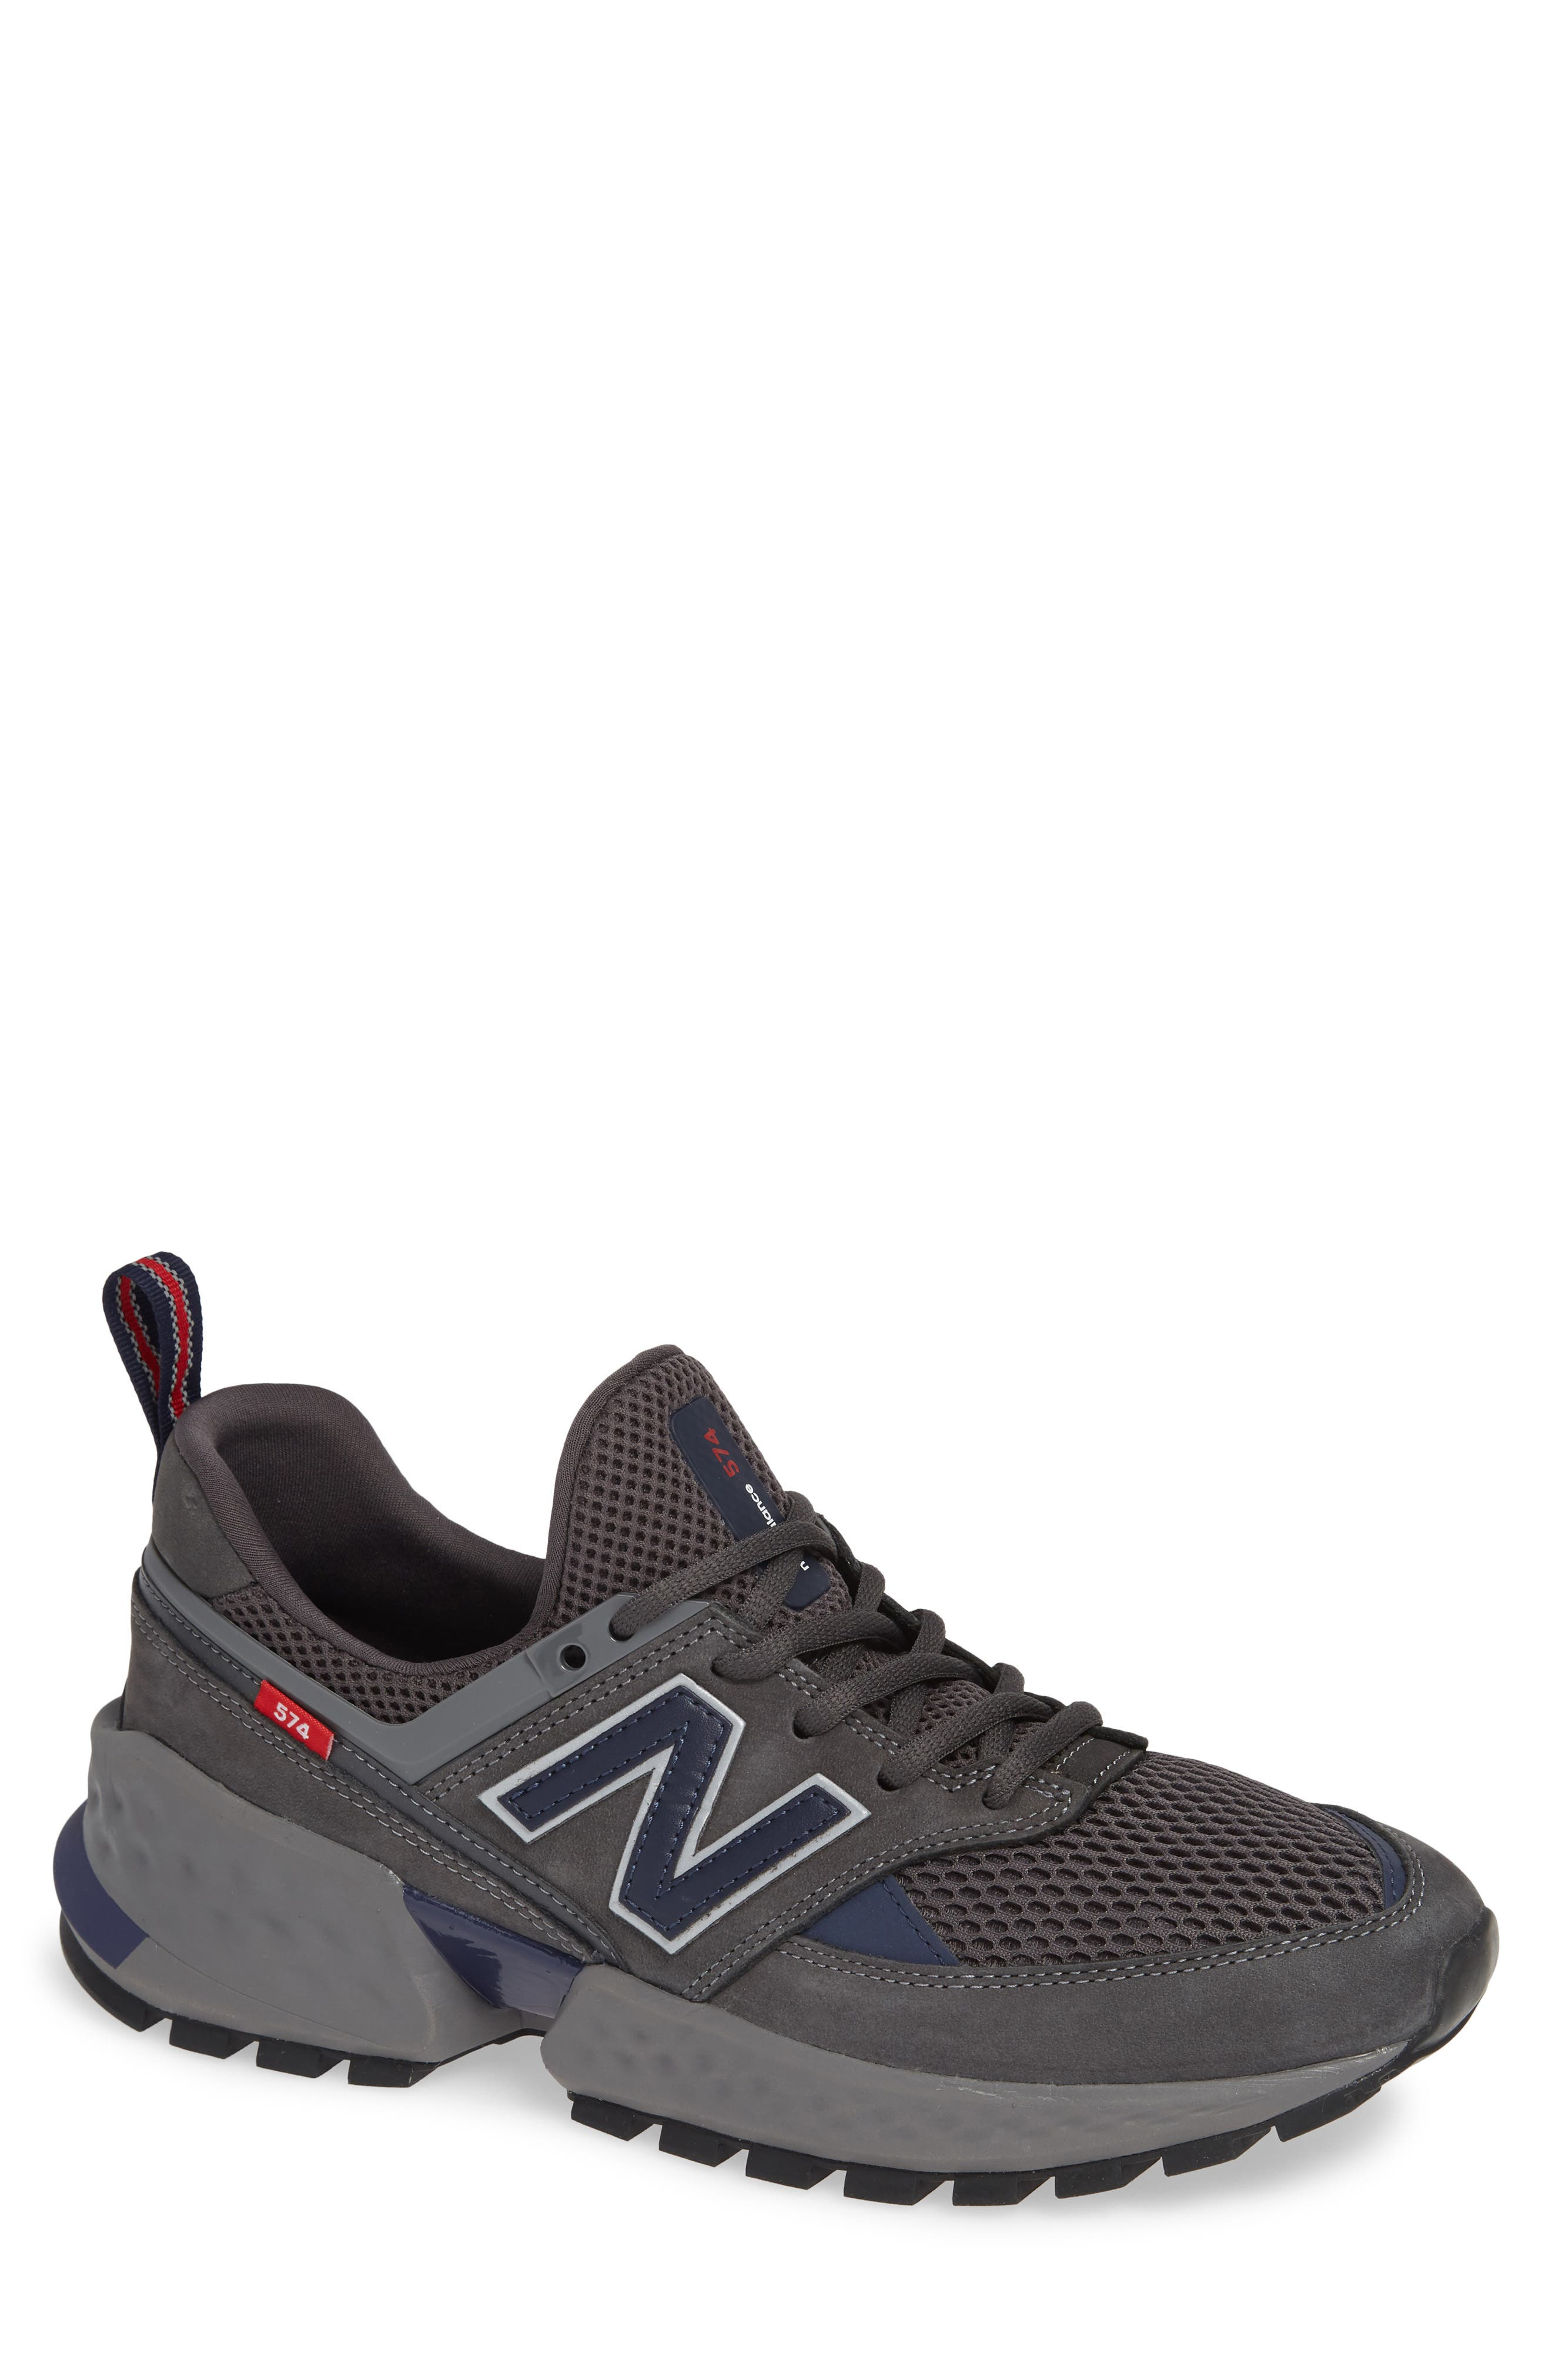 NEW BALANCE, 574 Sport Sneaker, Main thumbnail 1, color, MAGNET